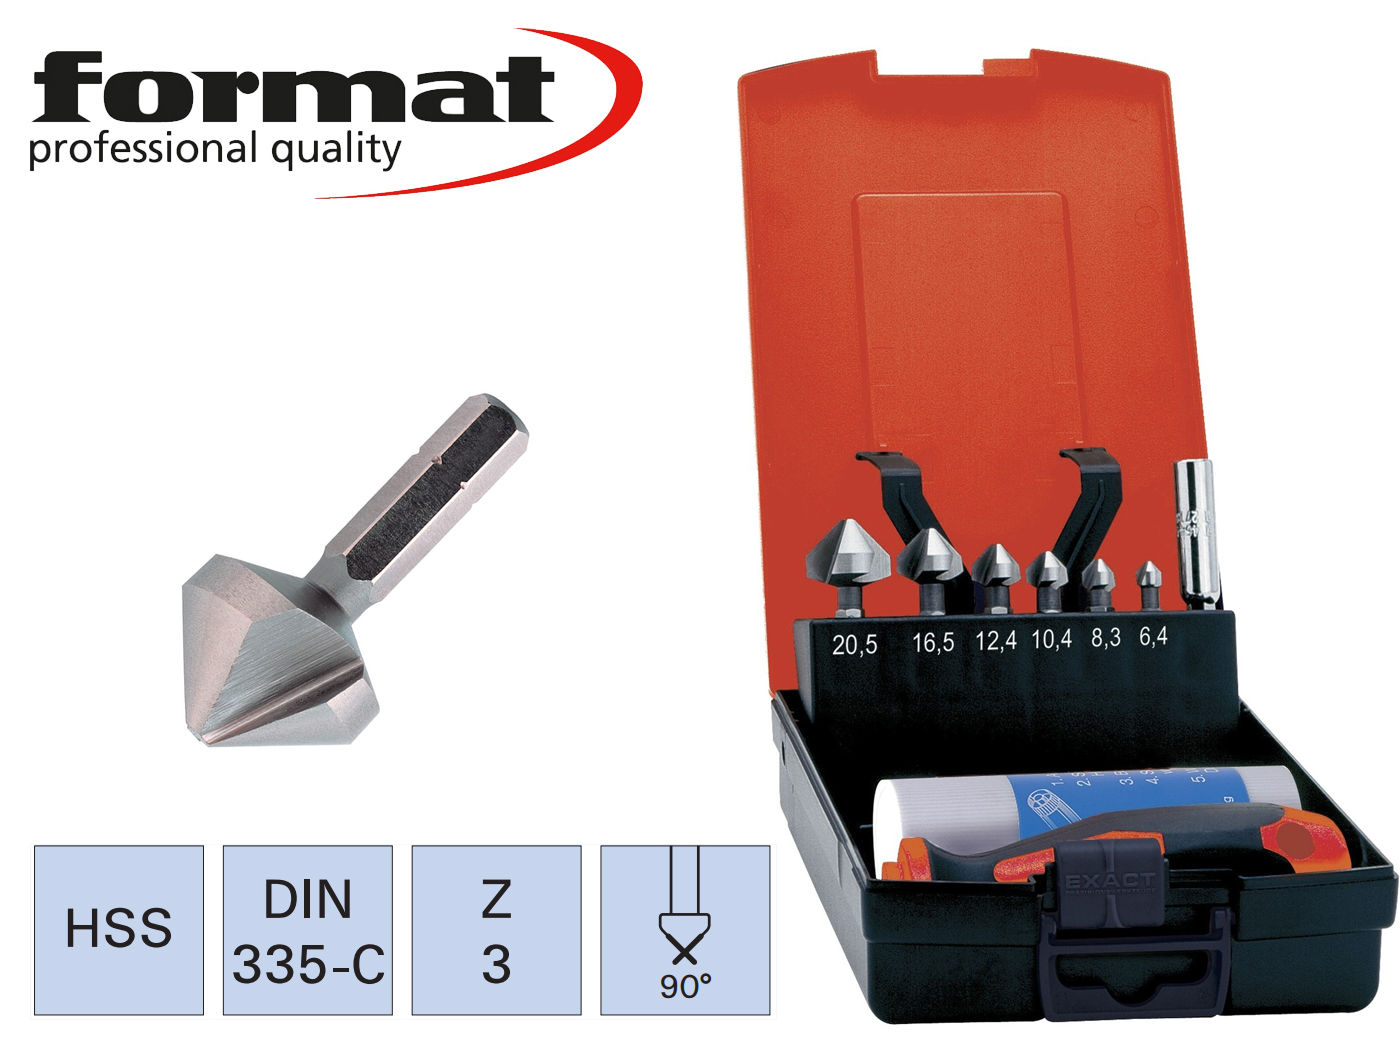 verzinkboren Bit set HSS DIN 335 C 90G FORMAT   DKMTools - DKM Tools